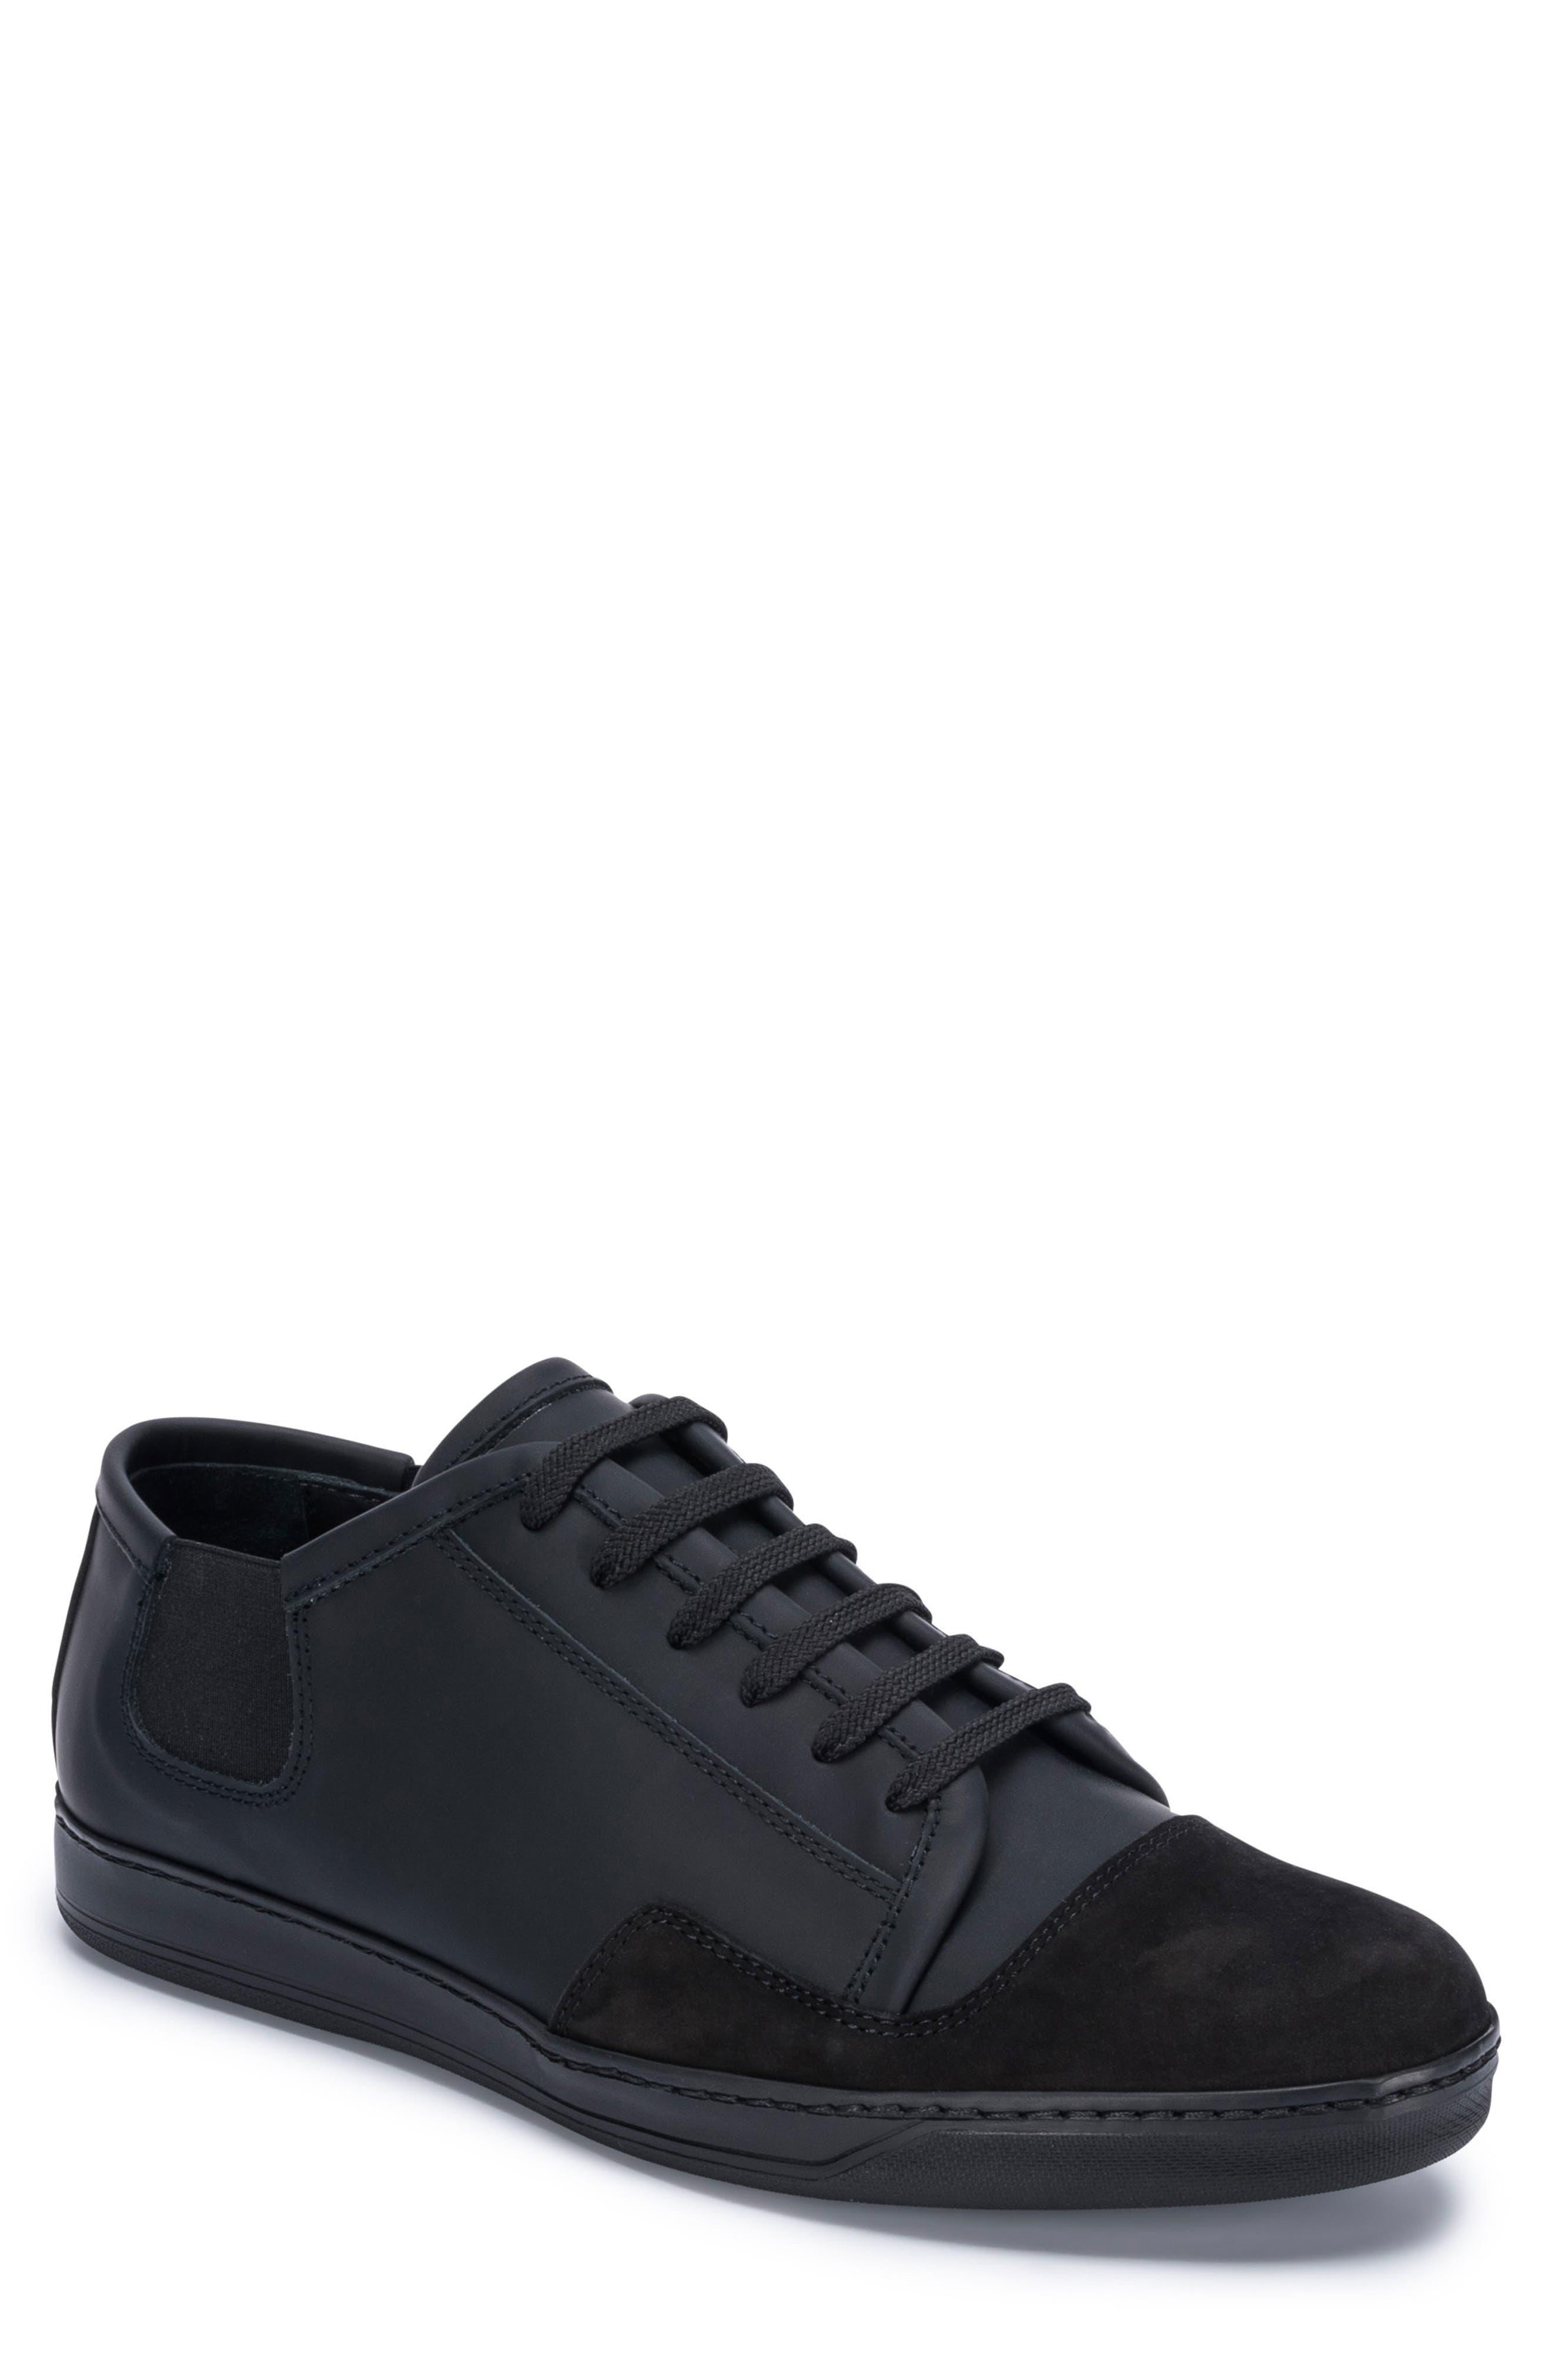 Bellagio Sneaker,                         Main,                         color, BLACK